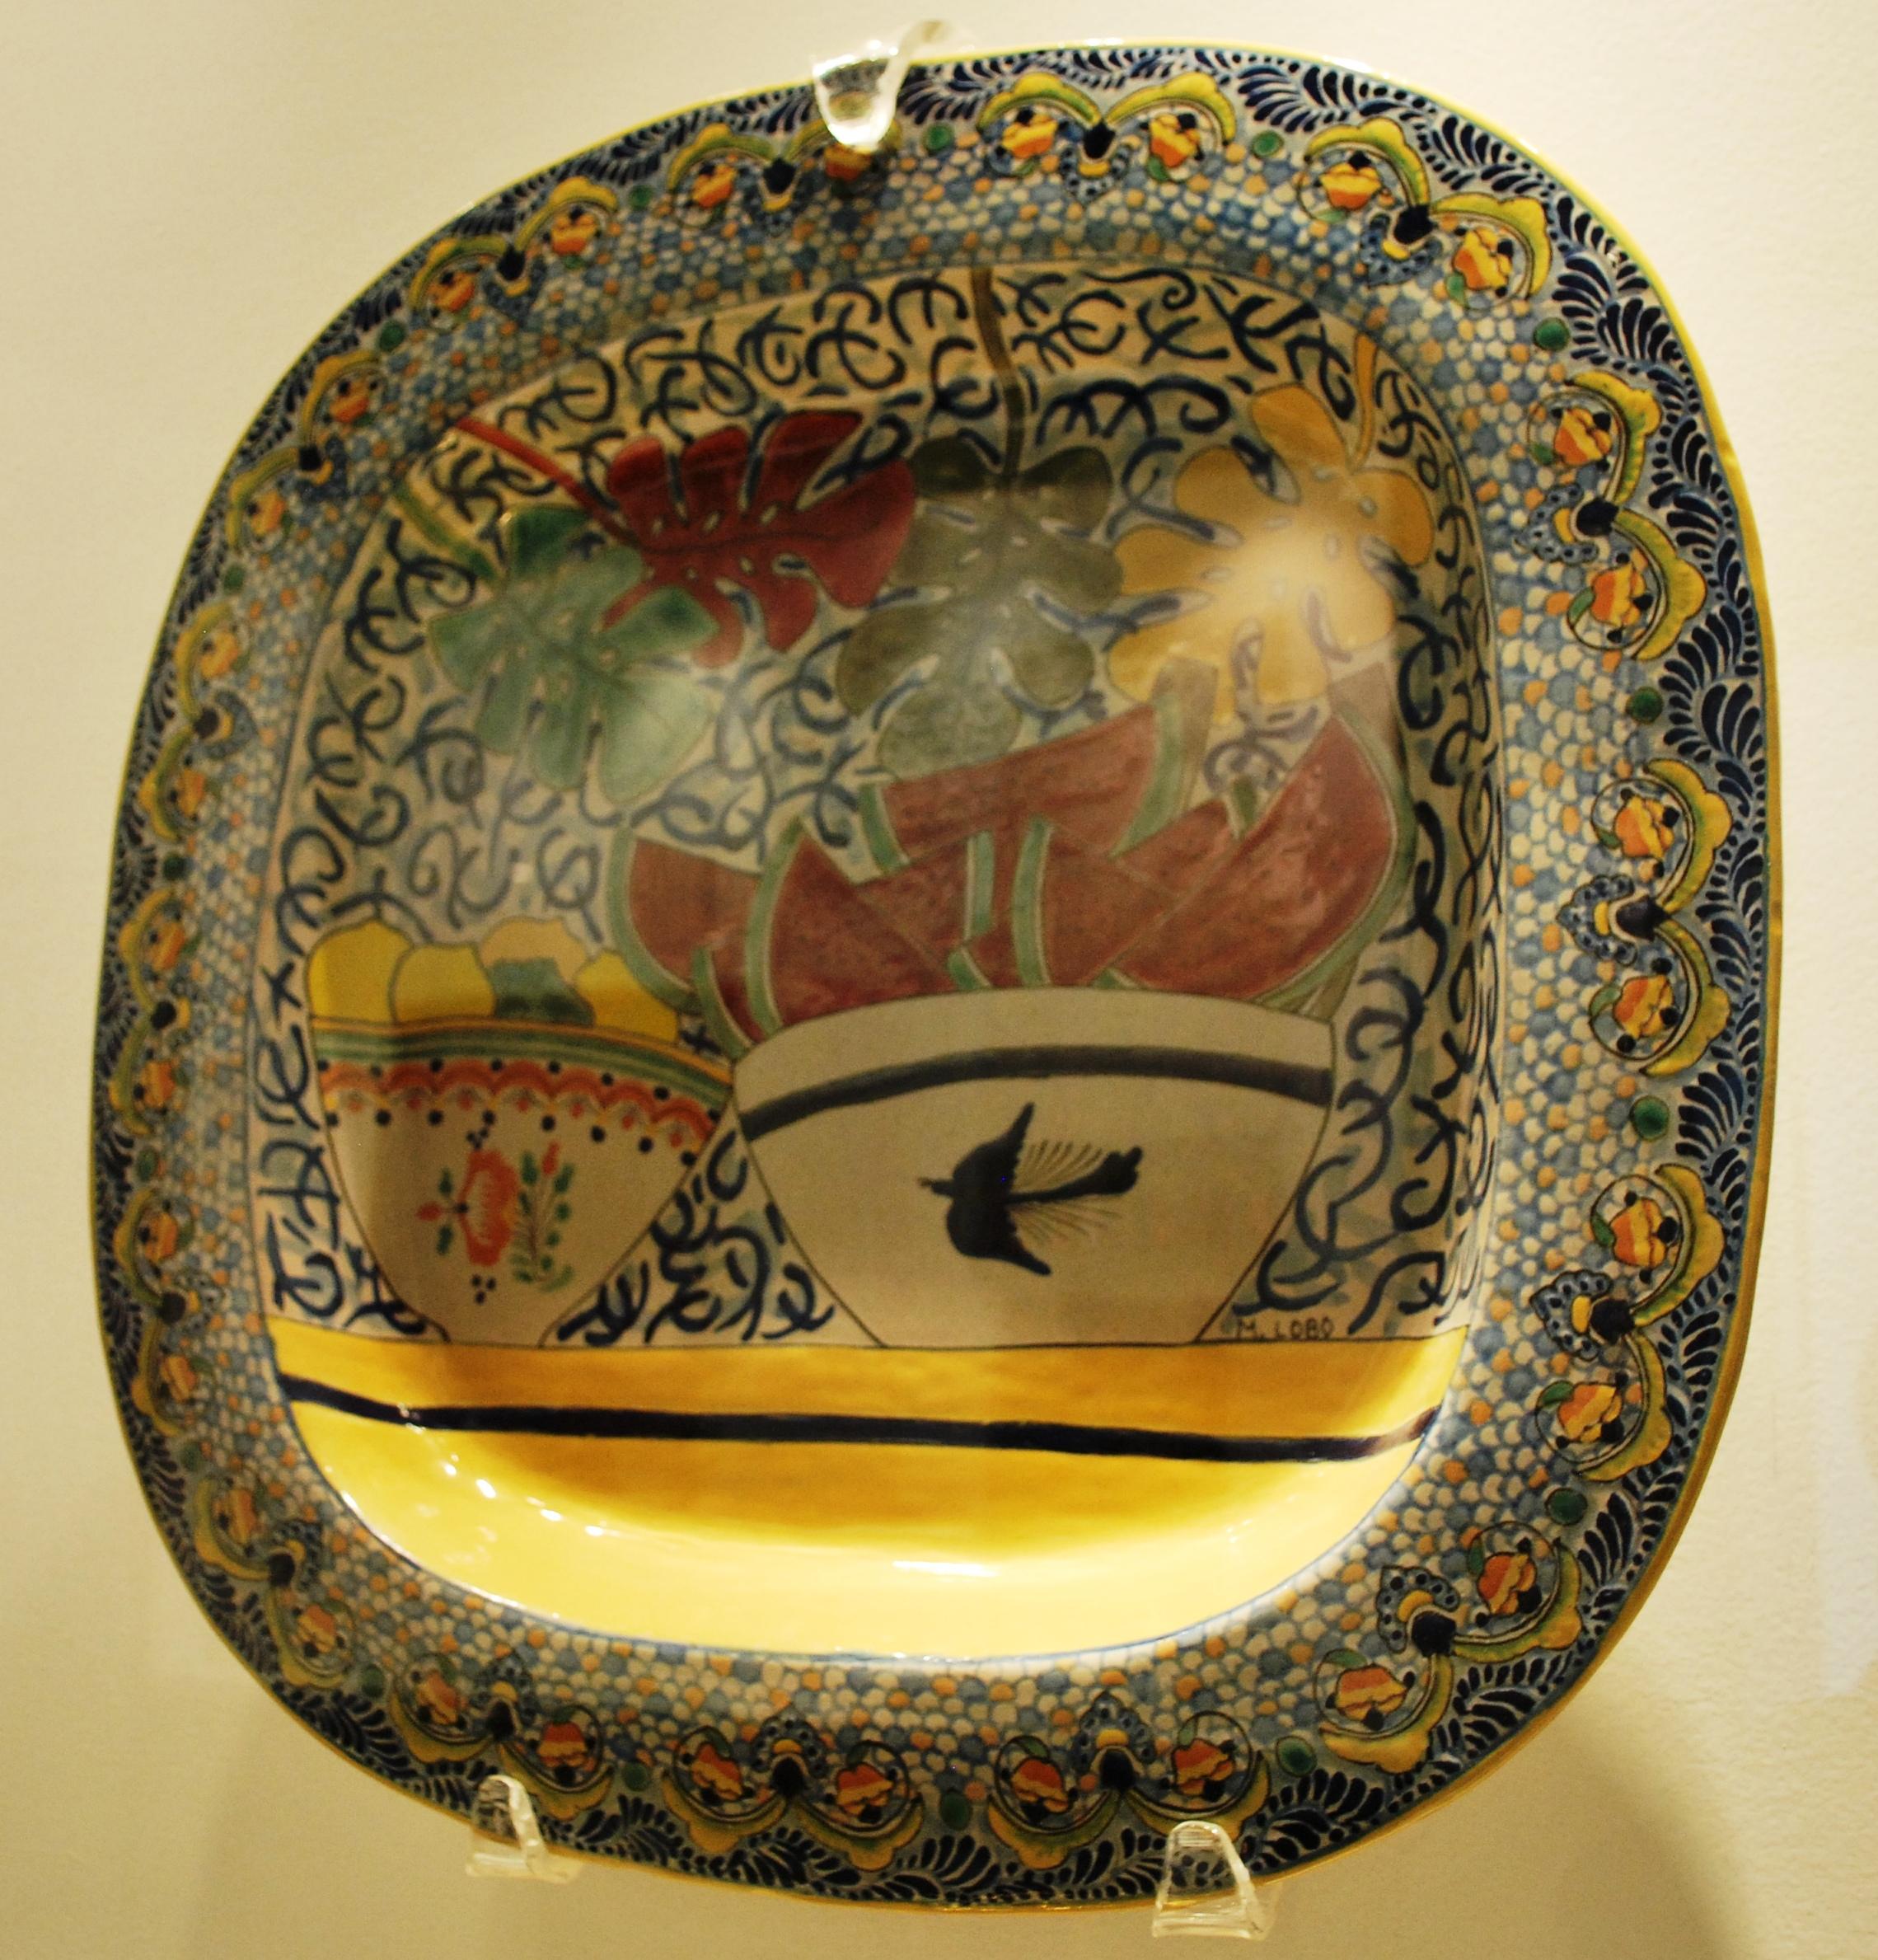 "Ysauro Uriarte Puebla Mexico Talavera Pottery 14/"" Round Platter"